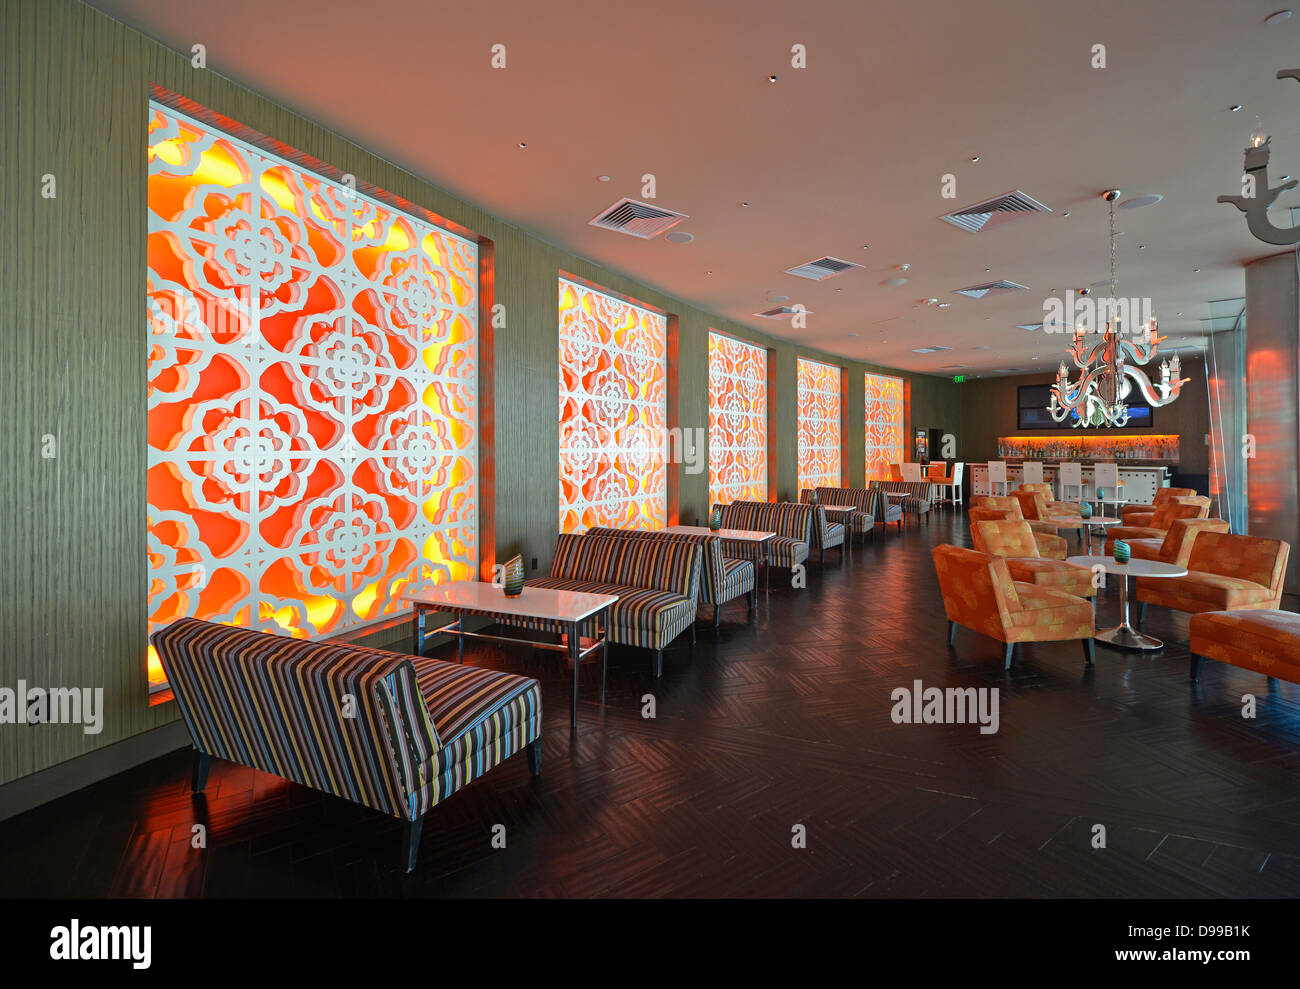 restaurant and bar retro look riviera resort spa hotel palm stock photo royalty free image. Black Bedroom Furniture Sets. Home Design Ideas